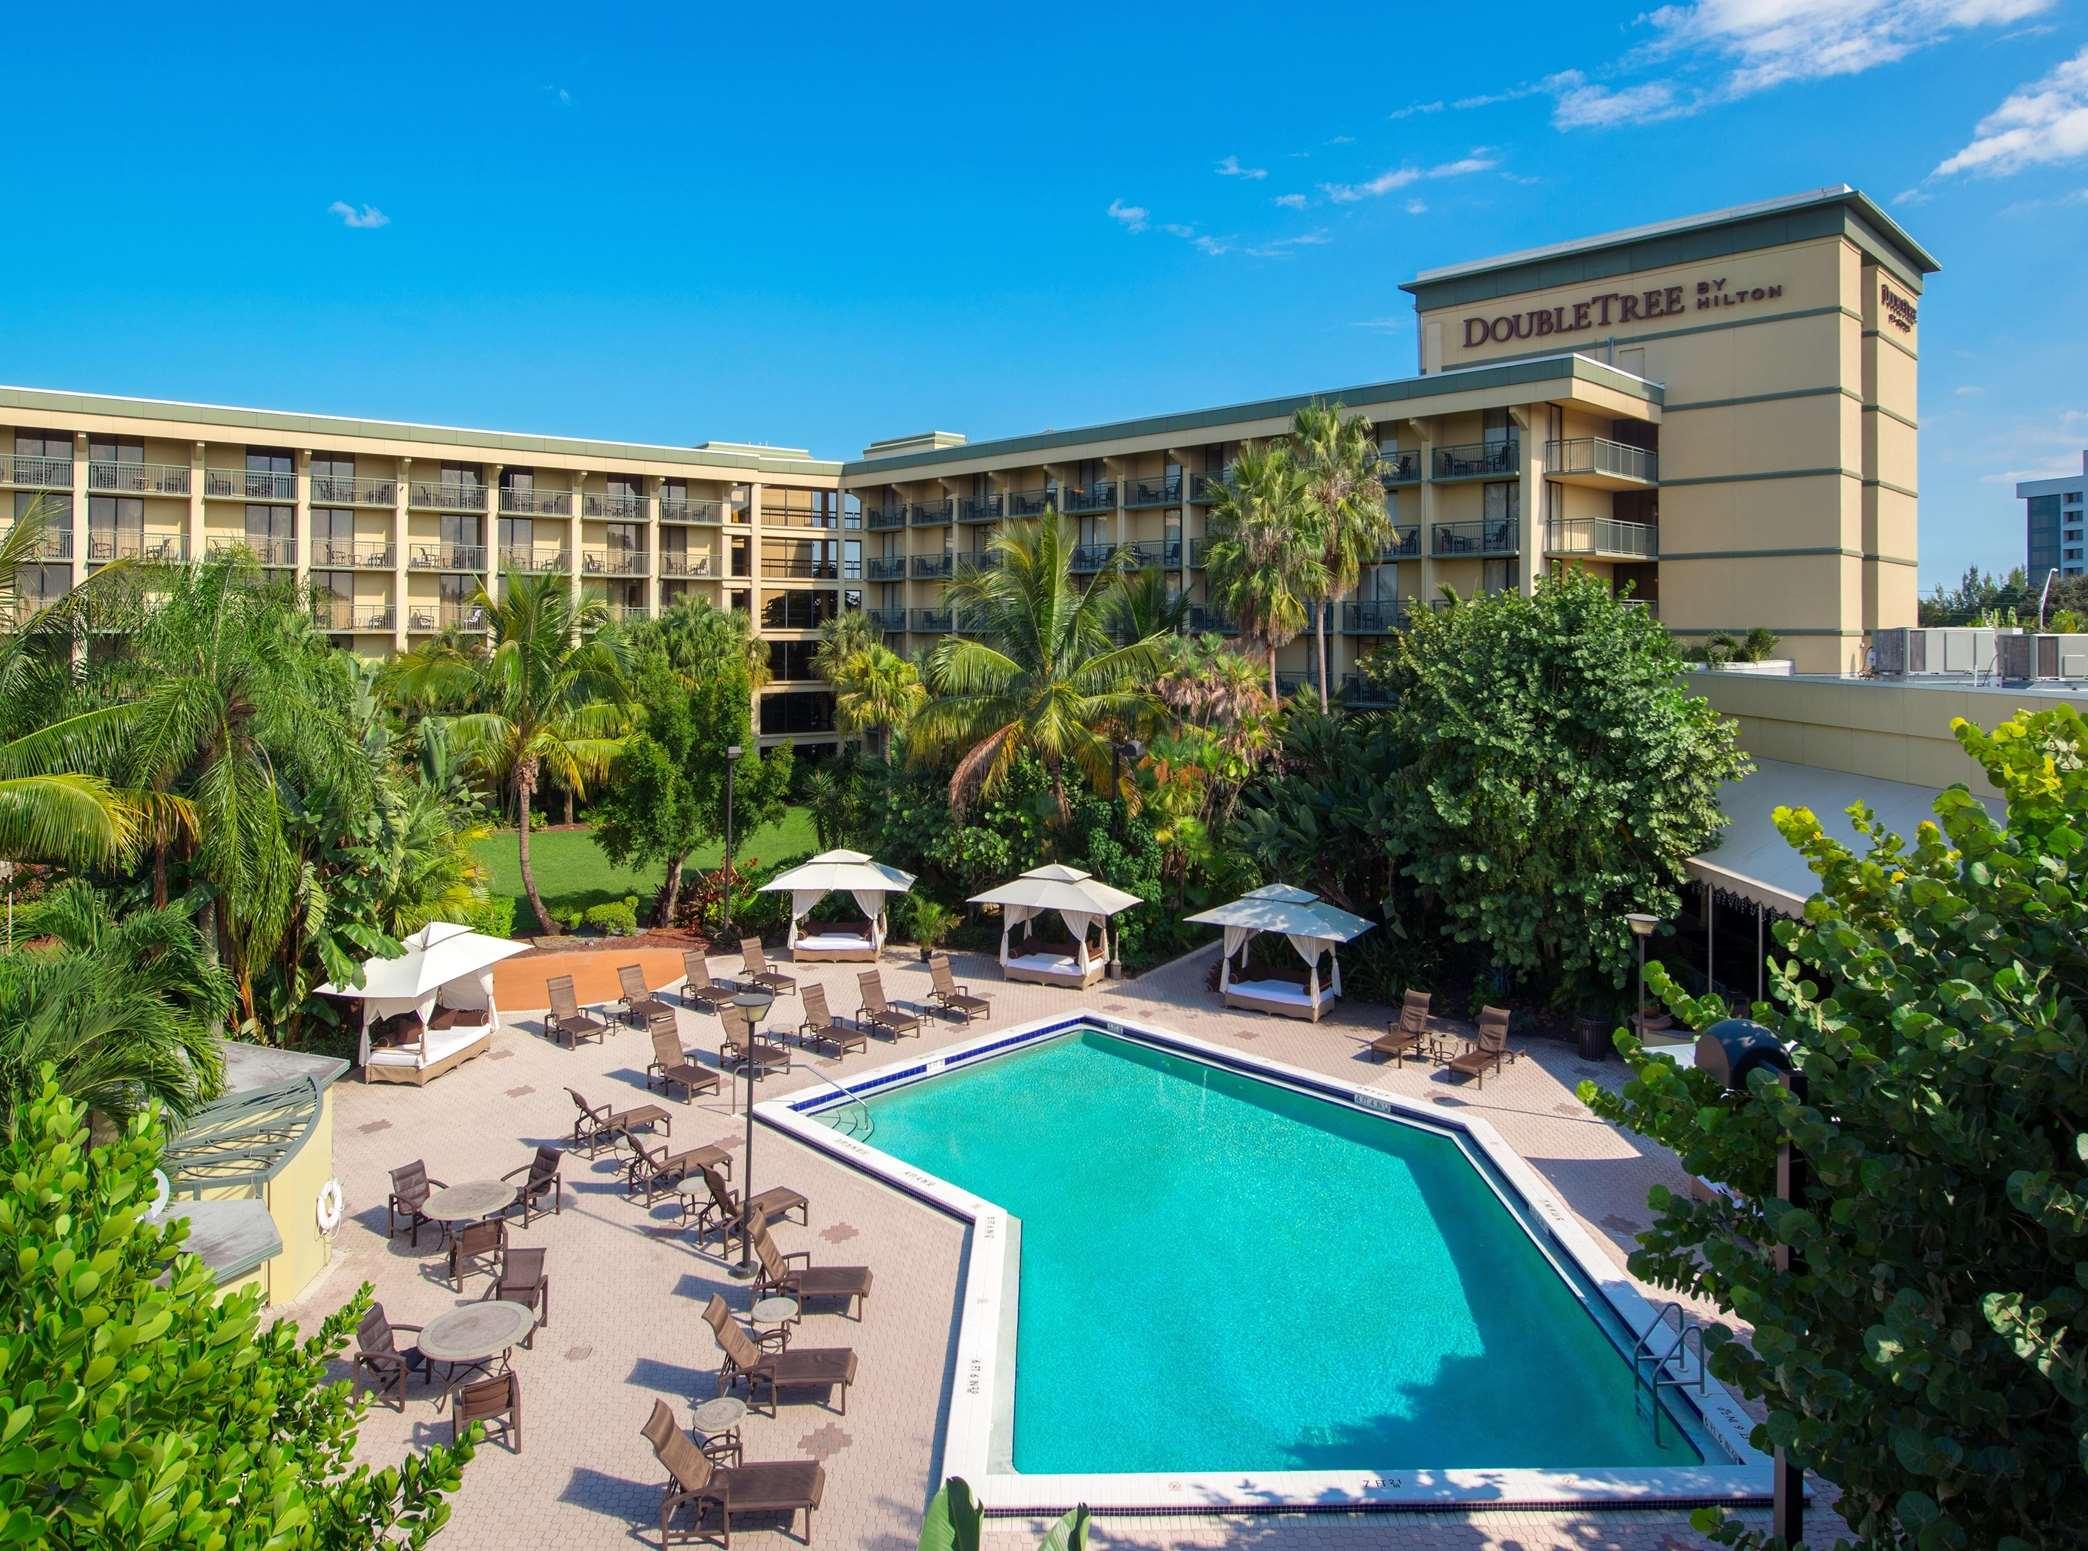 Doubletree By Hilton Hotel And Executive Meeting Center Palm Beach Gardens Palm Beach Gardens